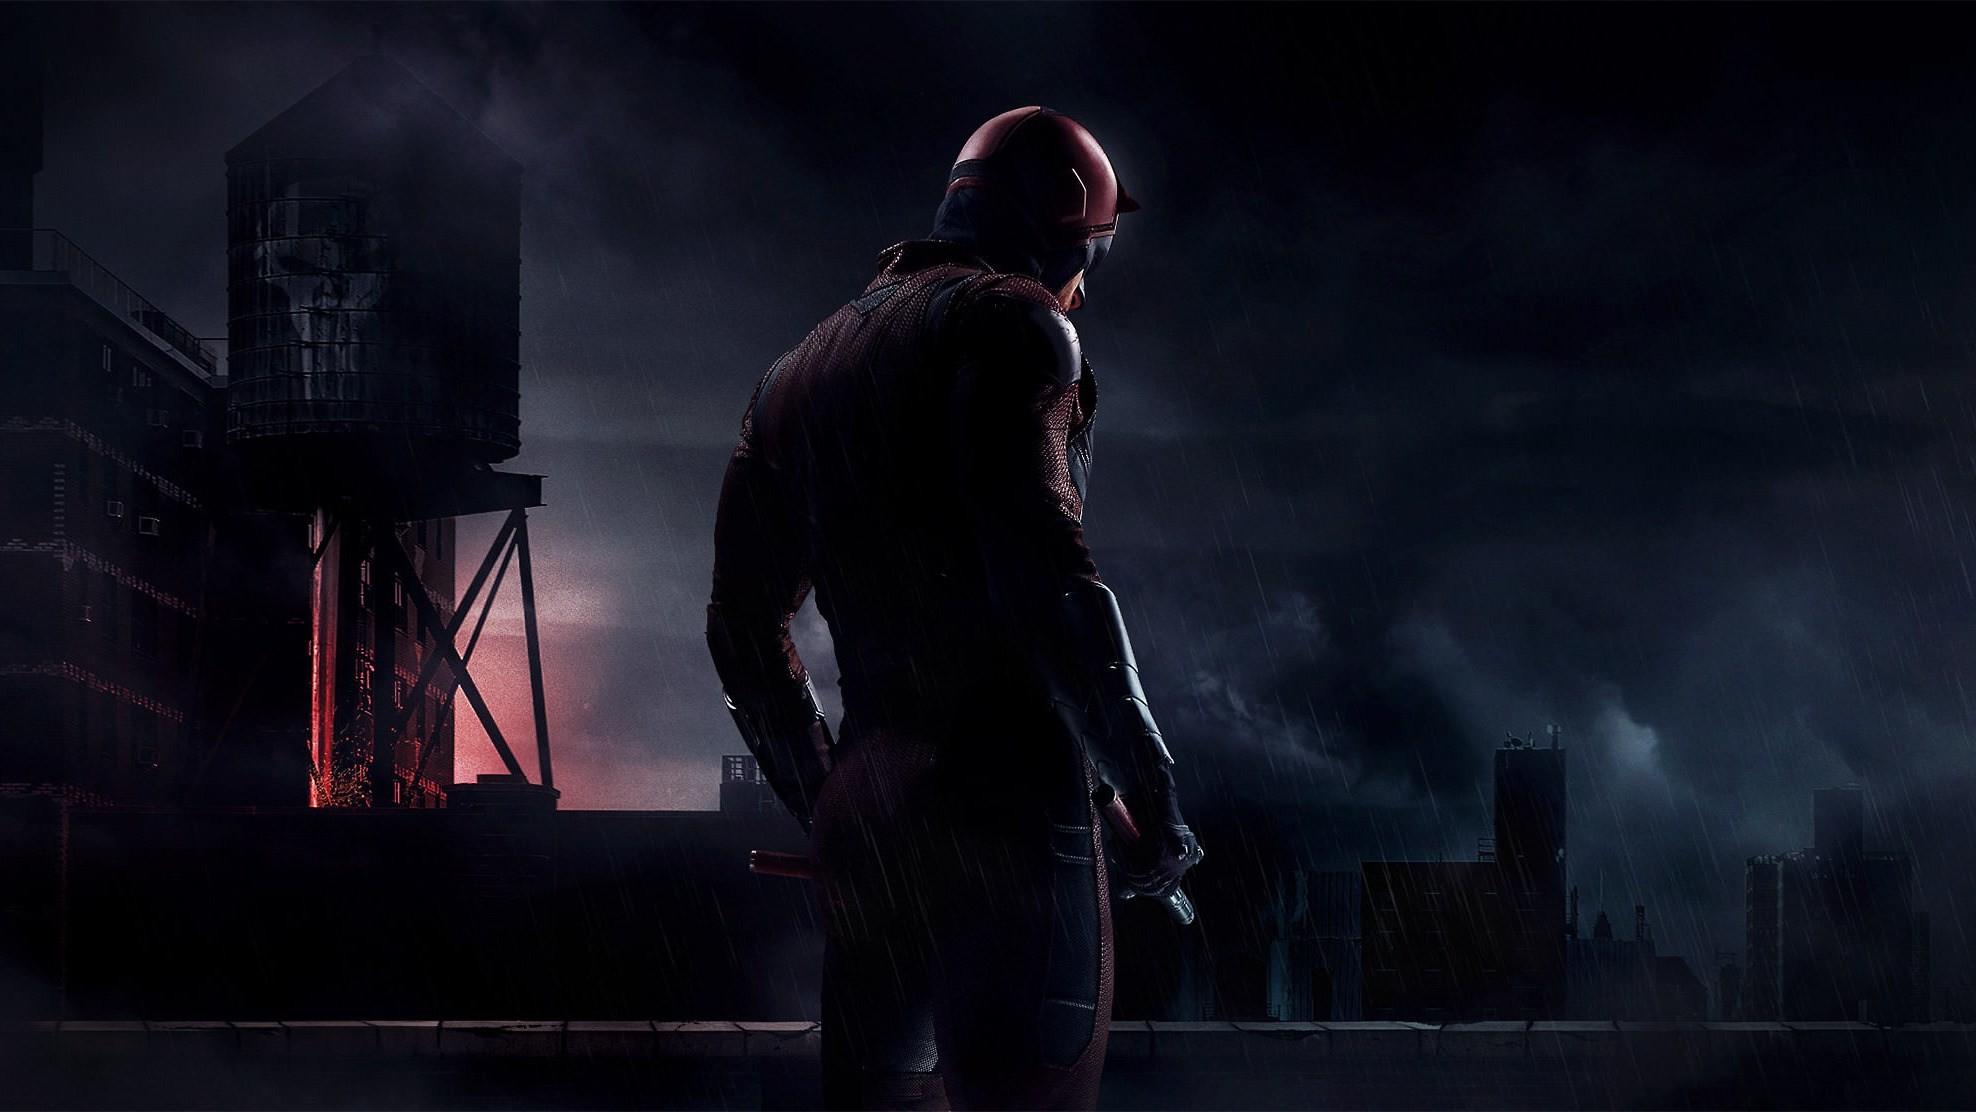 daredevil wallpaper hd  Netflix Daredevil HD Wallpaper (85  images)